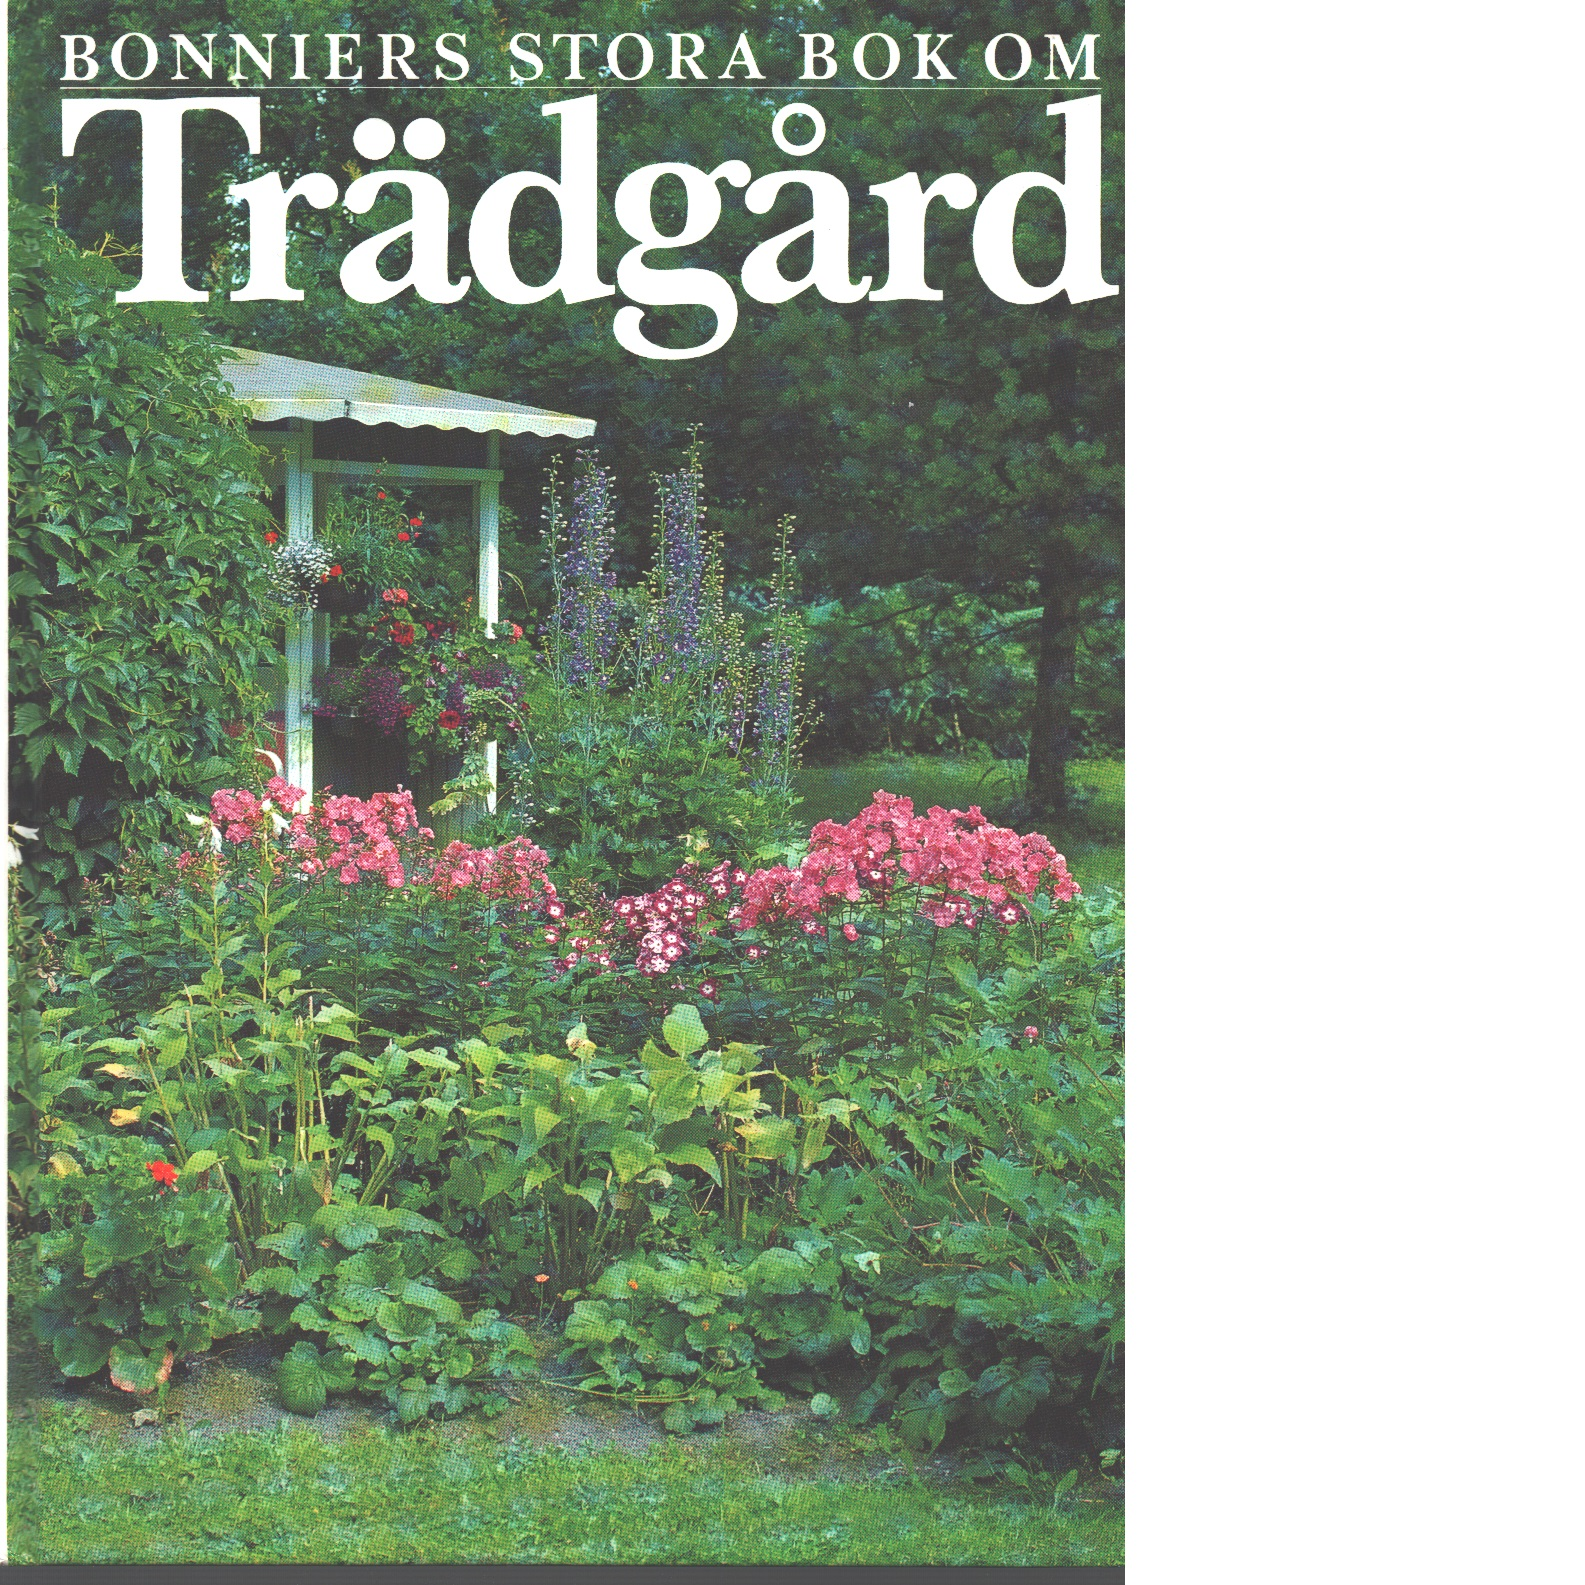 Bonniers stora bok om trädgård - Red. Nyberg, Sven-Olov och Nyblom-Holmberg, Gunnel